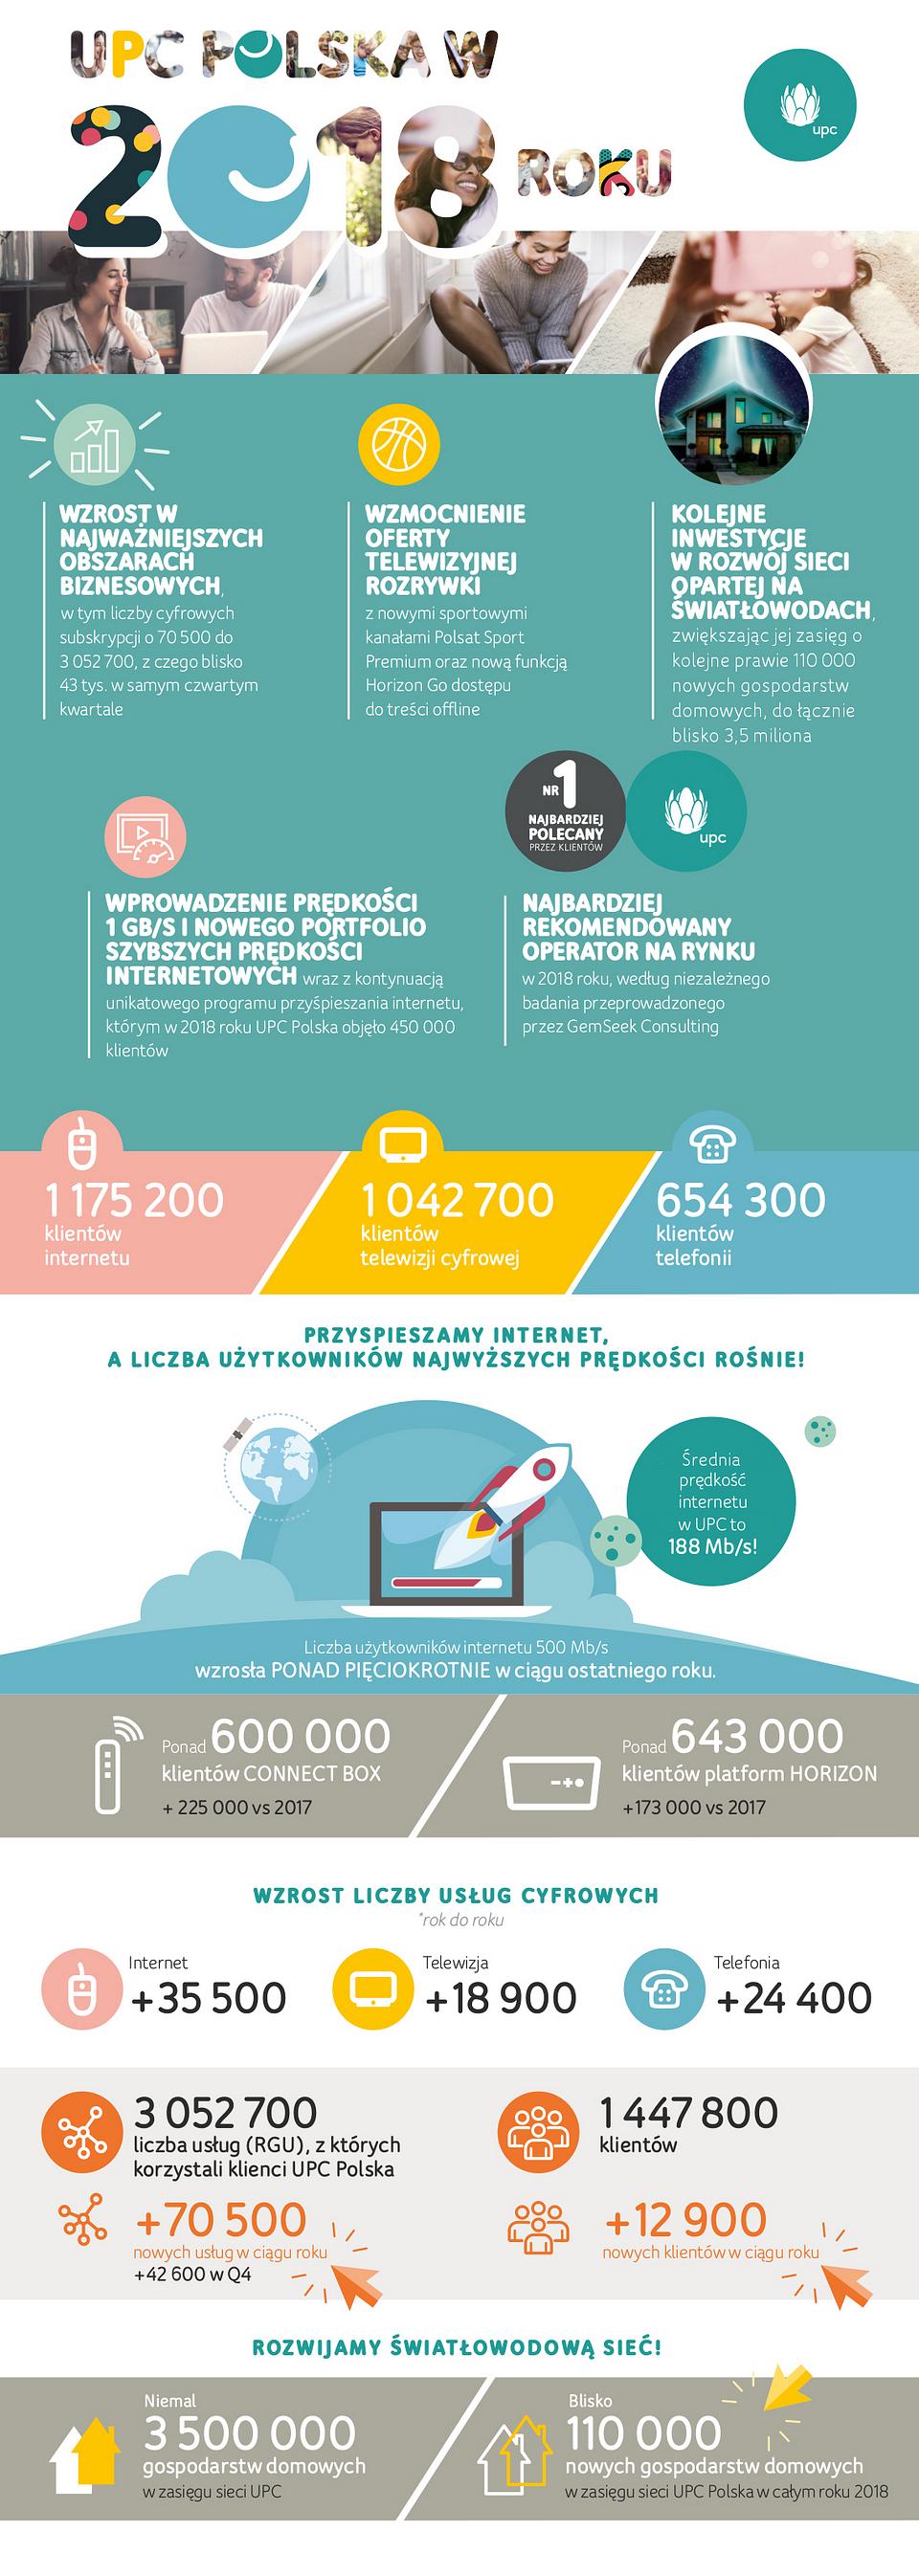 UPC POLSKA w 2018 infografika pion4_d2.png